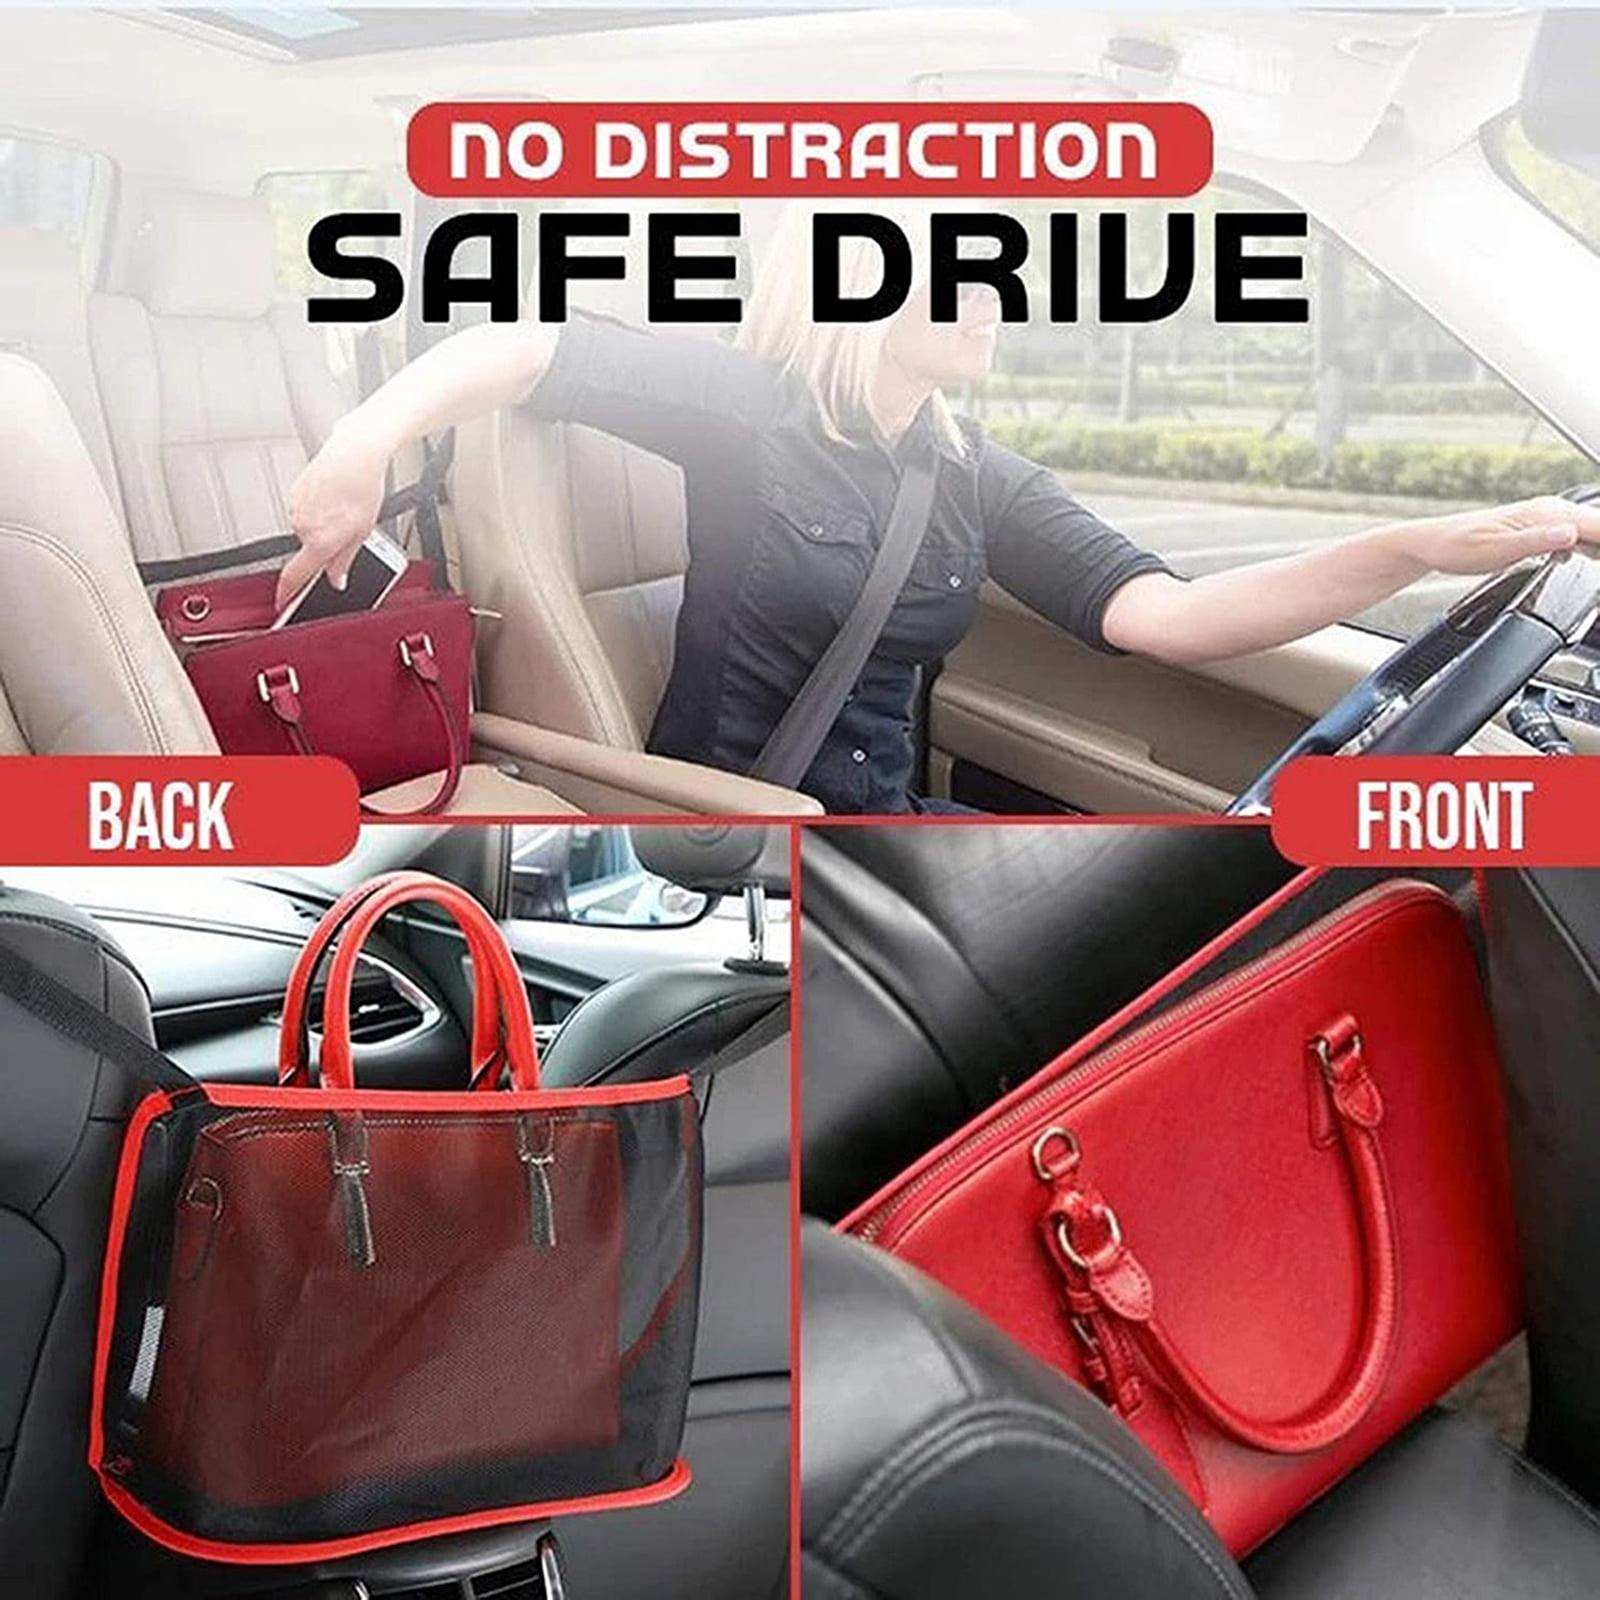 Large Capacity Car Seat Storage Net Bag for Storaging Handbag Purse Phones Cargo Tissue Kids Pets Barrier of Backseat Classic-black WAEKIYTL Car Net Pocket Handbag Holder Car Mesh Organizer